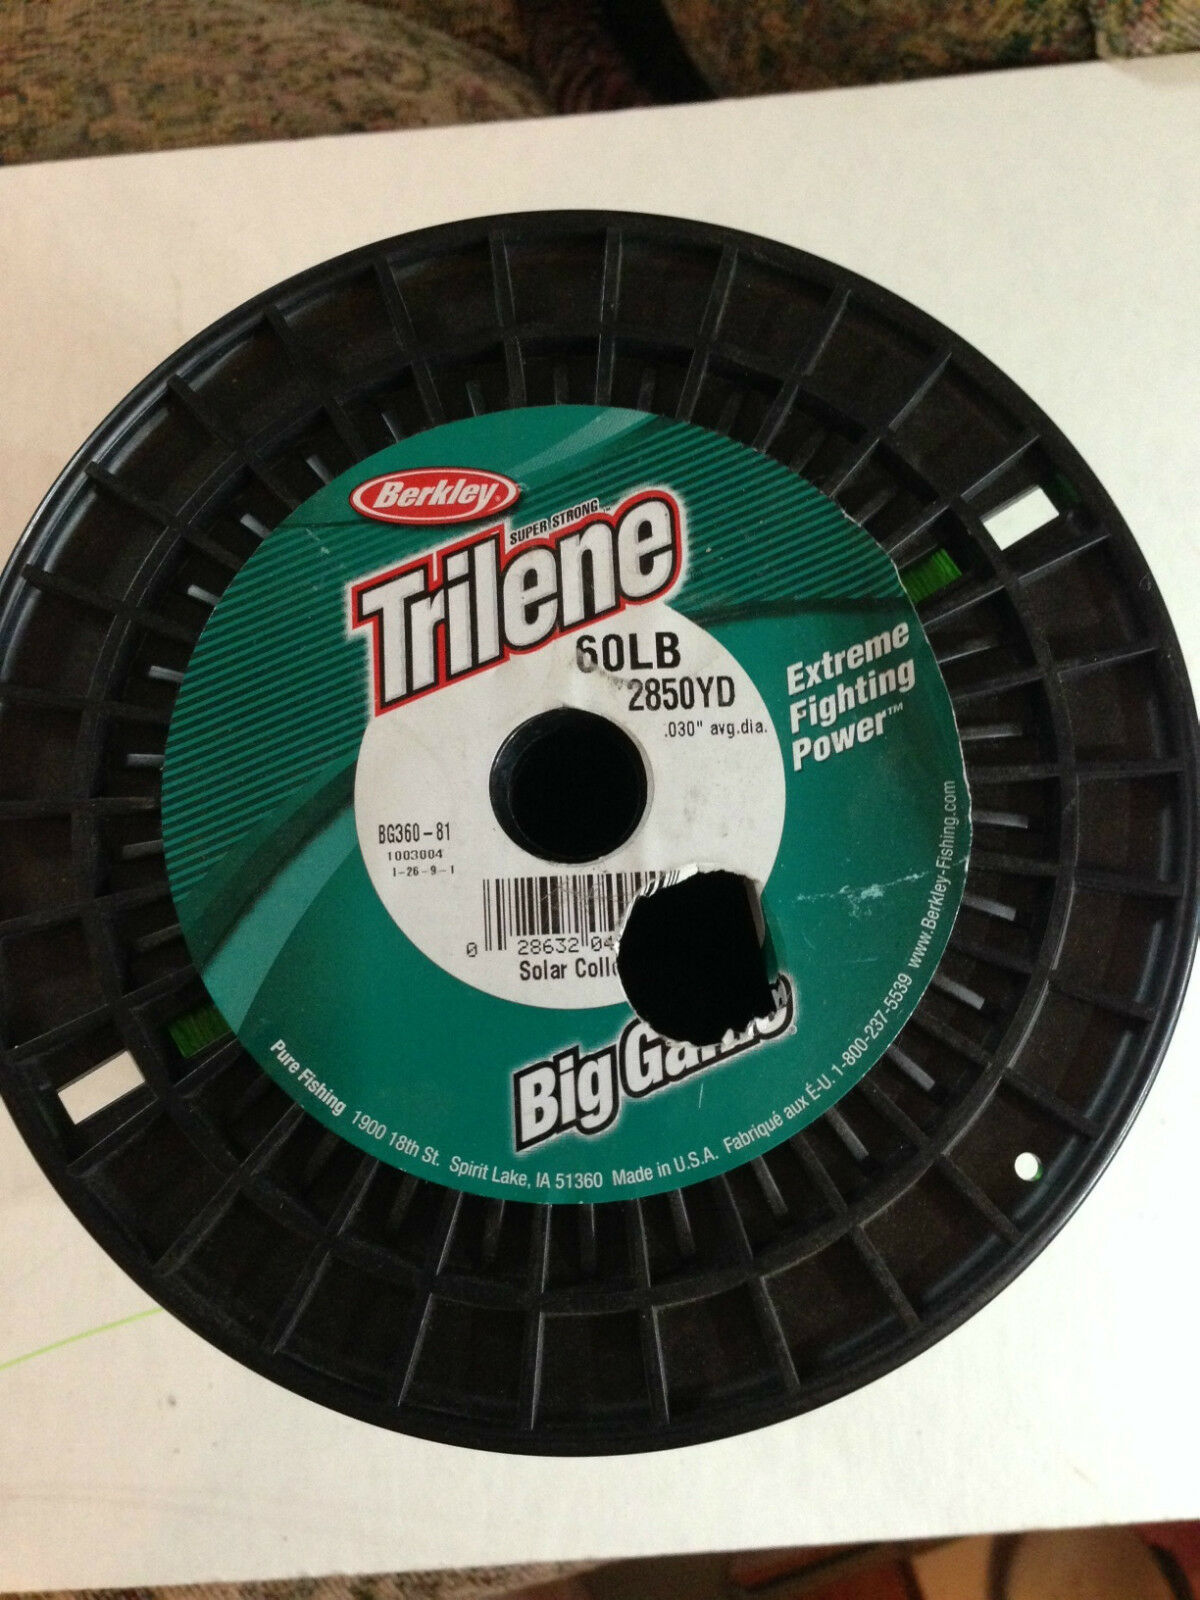 Berkley BG36081 Trilene Big Game 60 pound verde partial spool